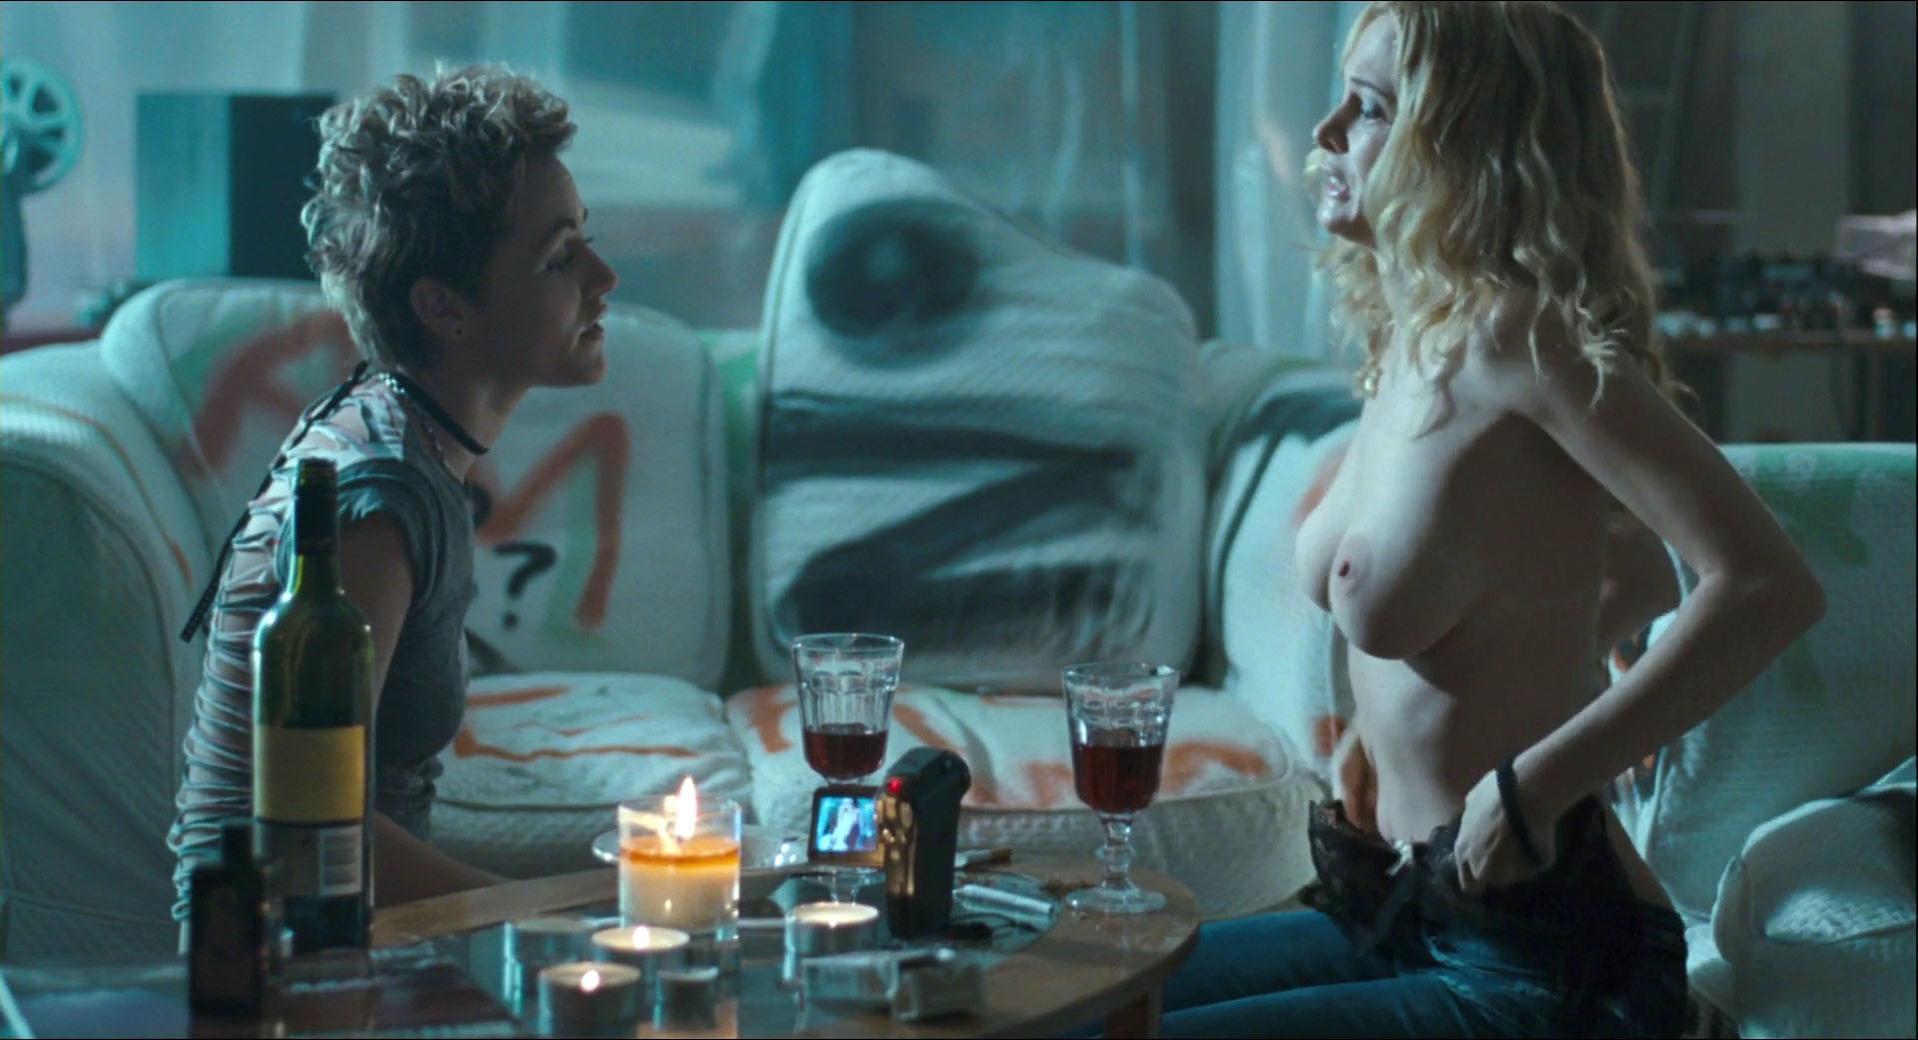 Shanti carson nude sex scene in shortbus scandalplanetcom - 3 part 5